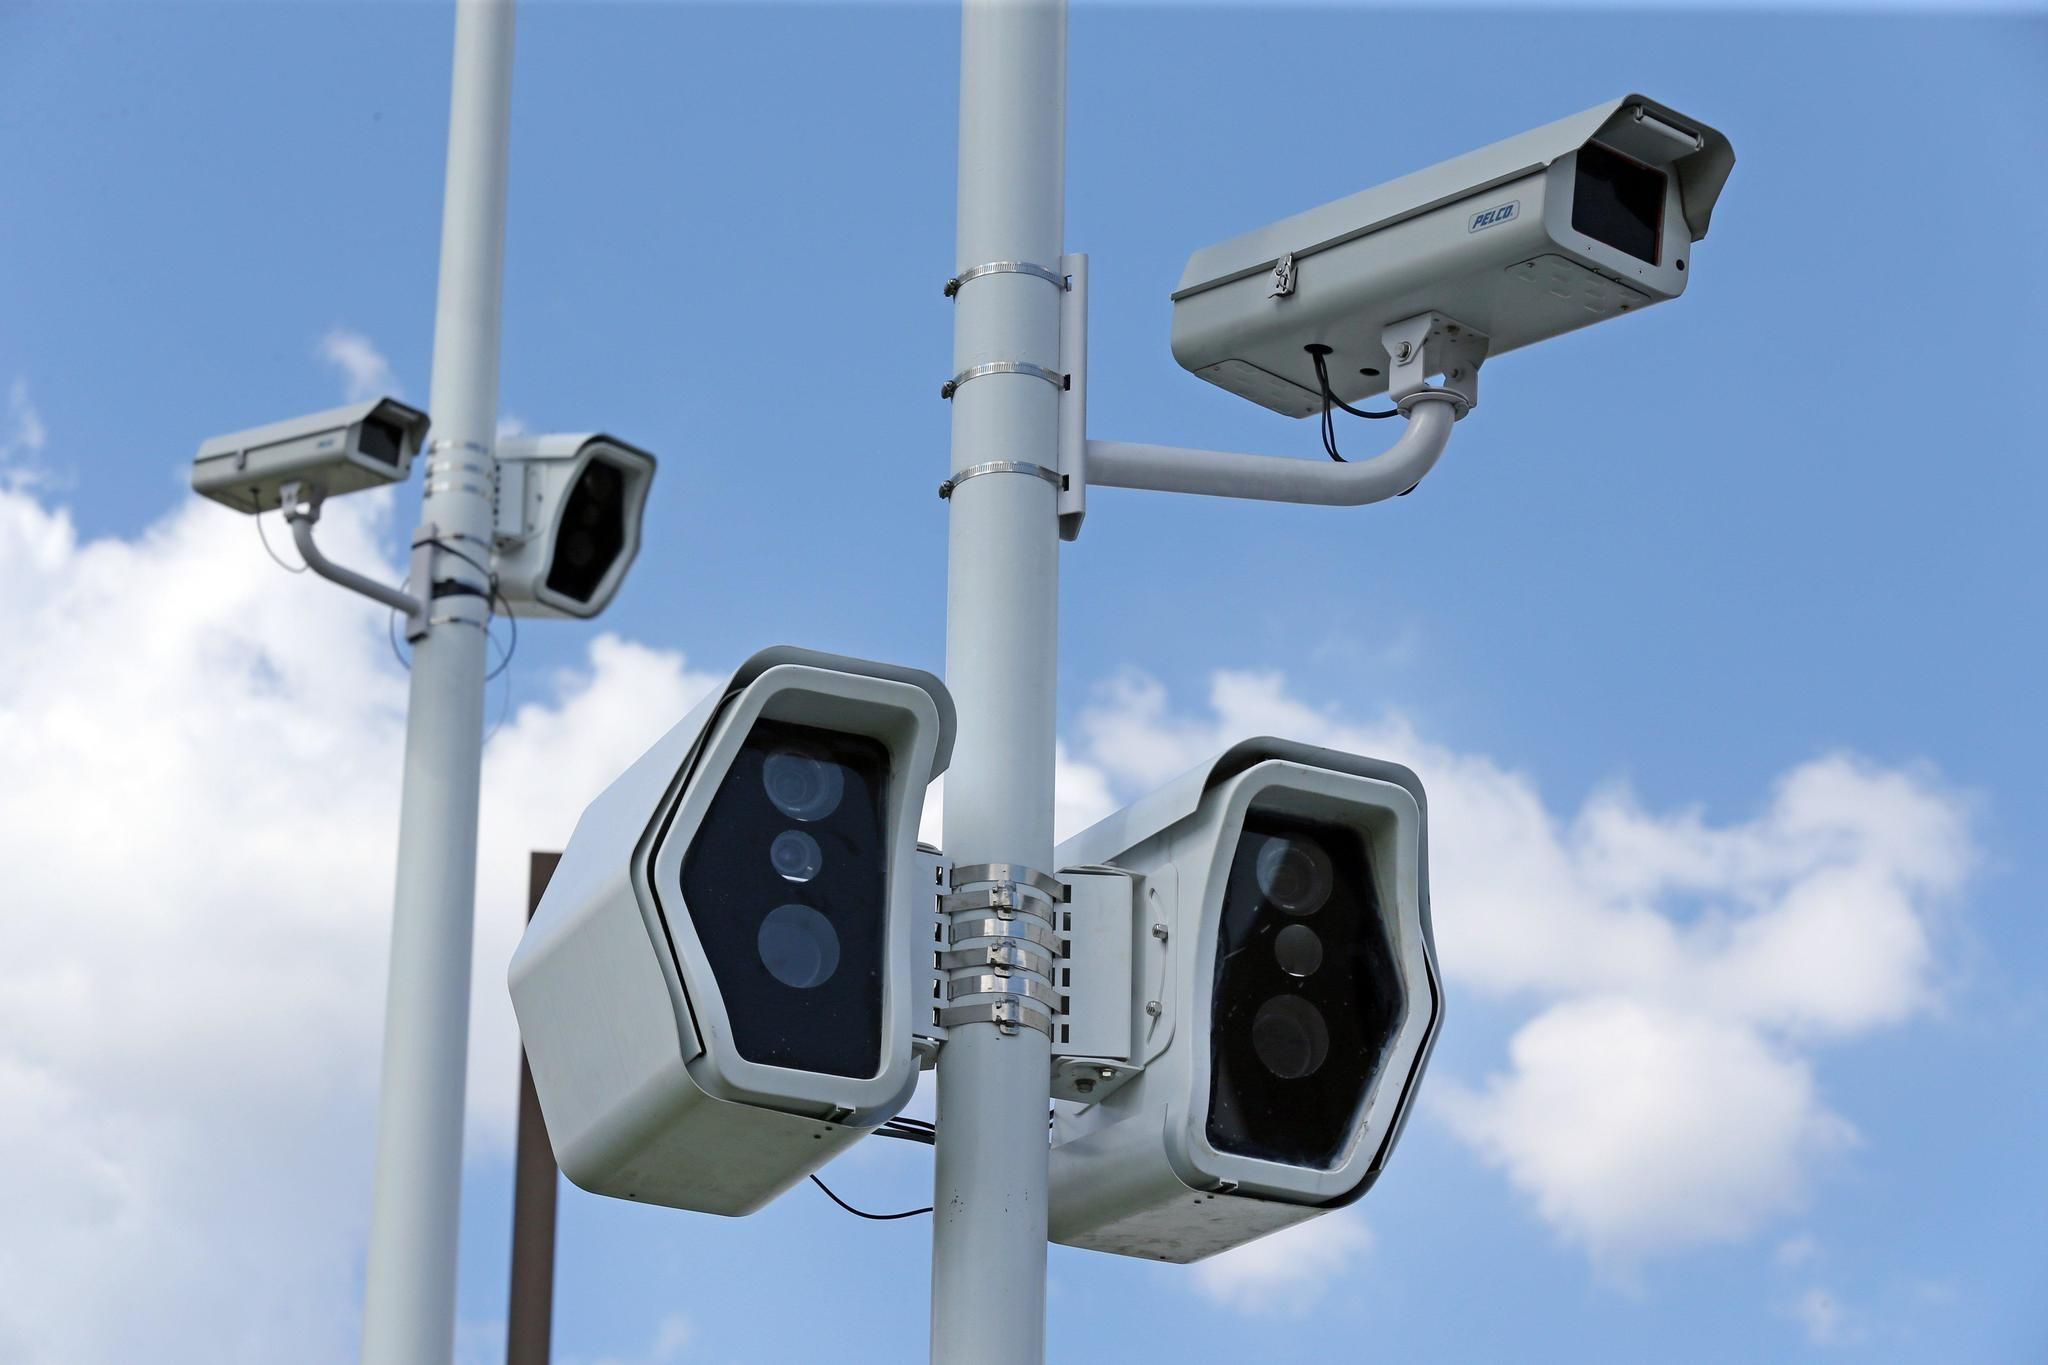 Gurnee, Waukegan mayors say red-light camera intersections